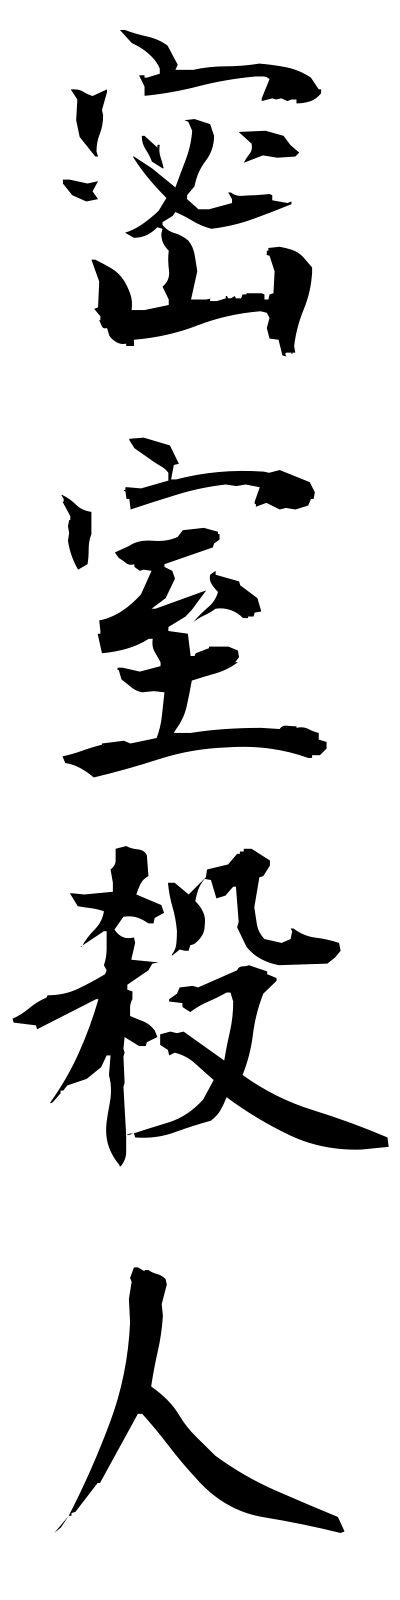 m20064 密室殺人 みっしつさつじん – 四字熟語